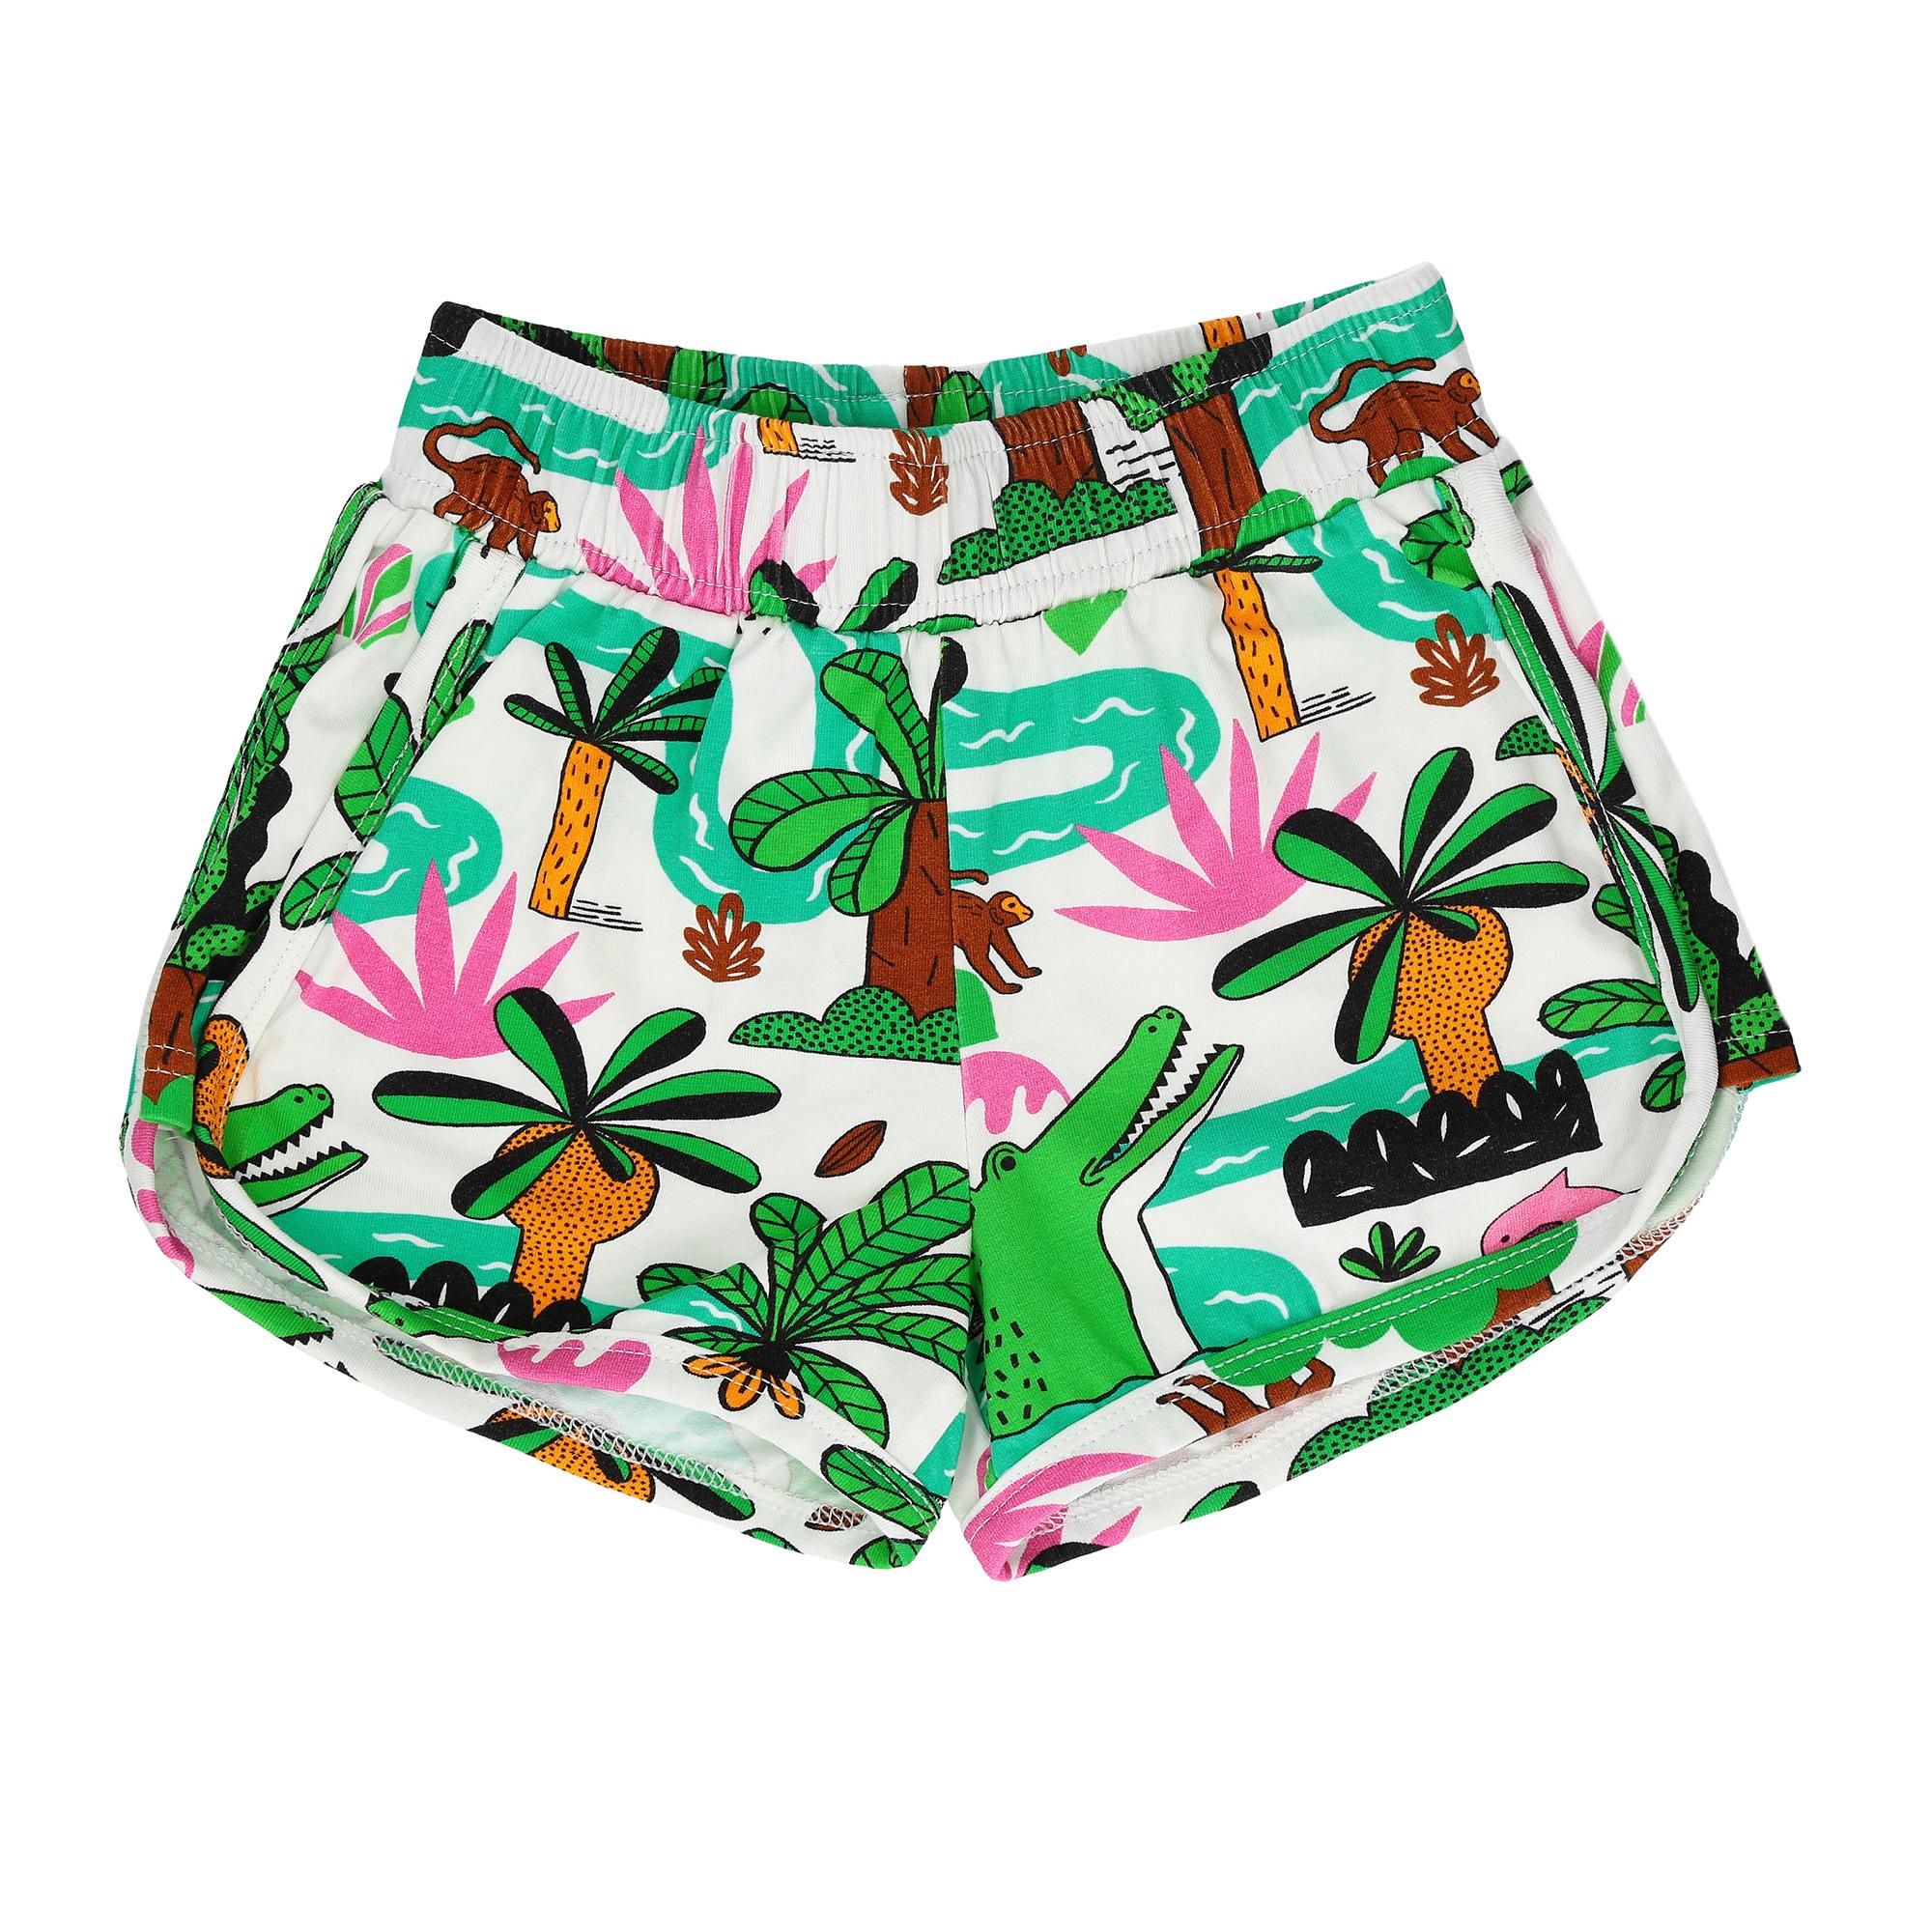 843fbe1744e54c Raspberry Republic Amazing Amazonia Shorts - Eddie & Min